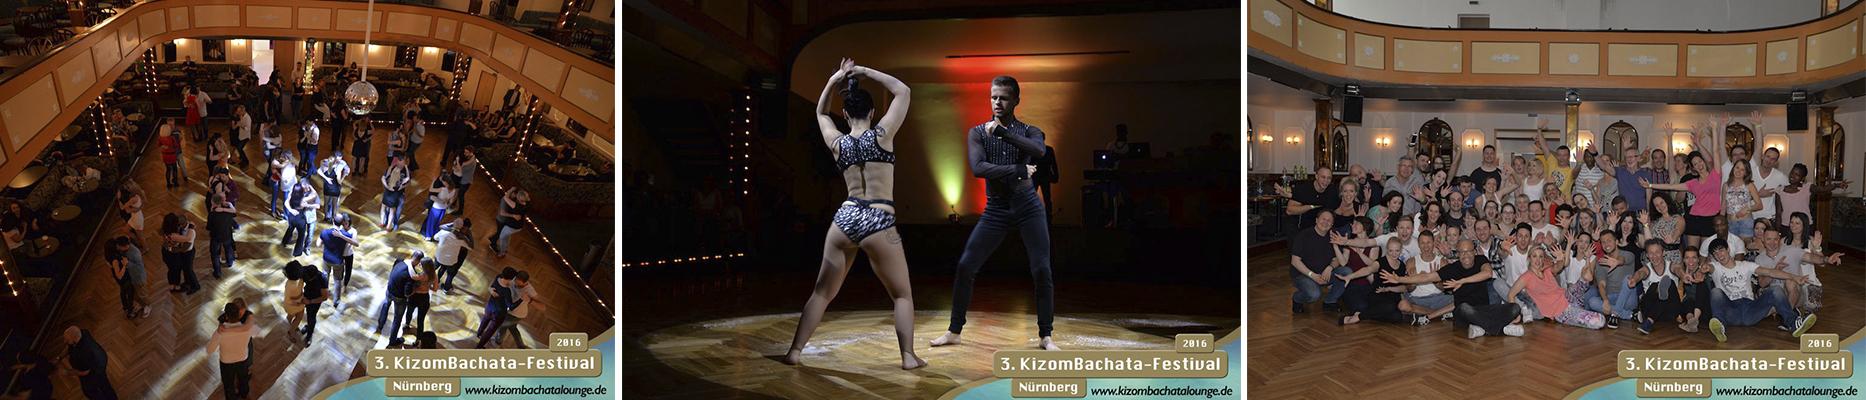 KizomBachata_Festival_Fuerth_Nuernberg_3